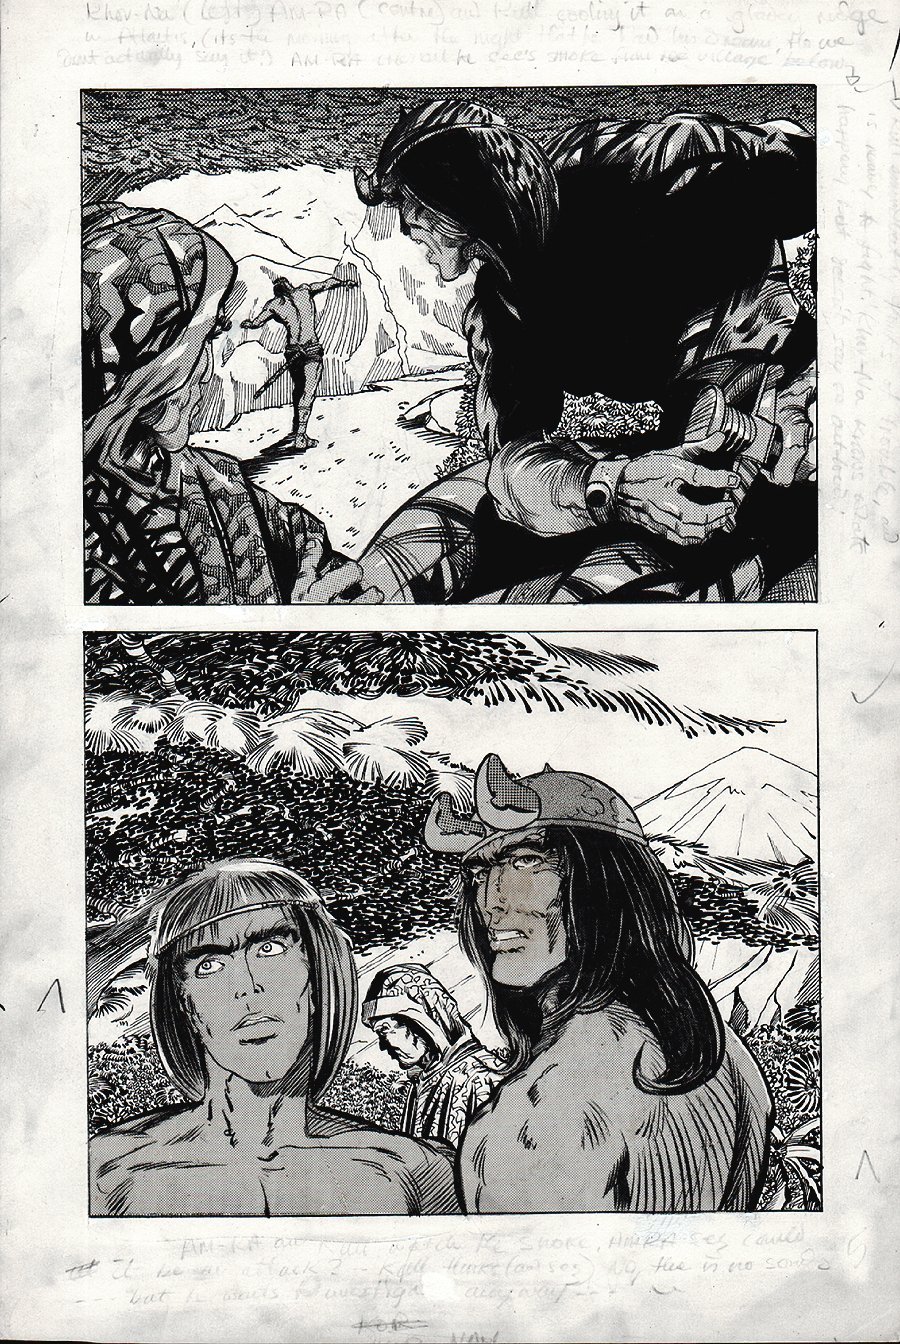 Kull Of Atlantis p 7 (Precursor To Conan The Barbarian #1) 1969-1970